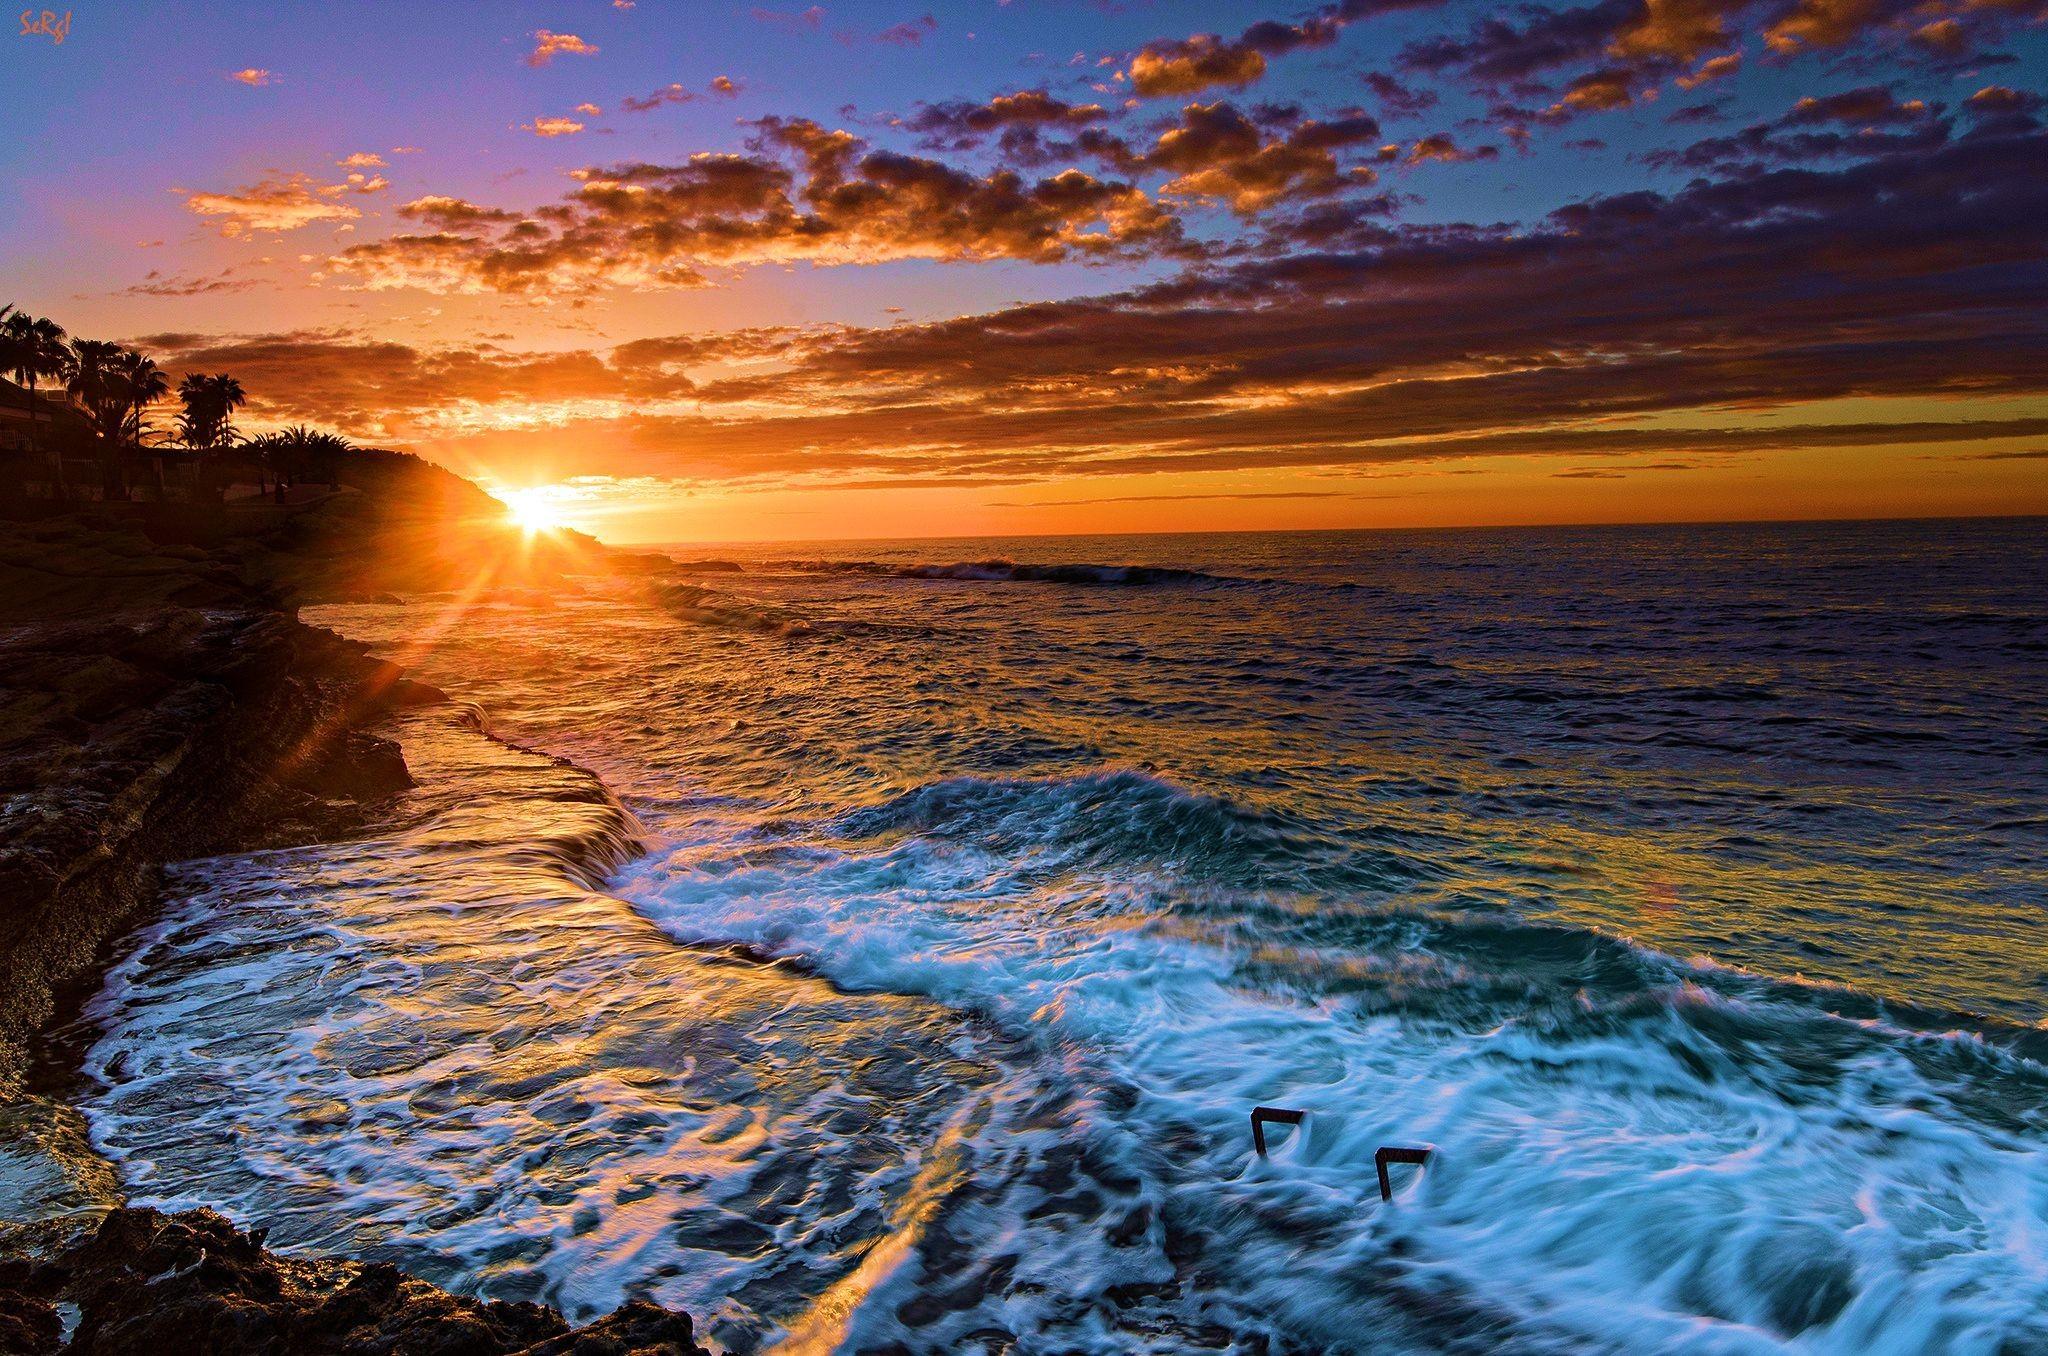 Sunset Desktop Backgrounds Free – Wallpaper Cave